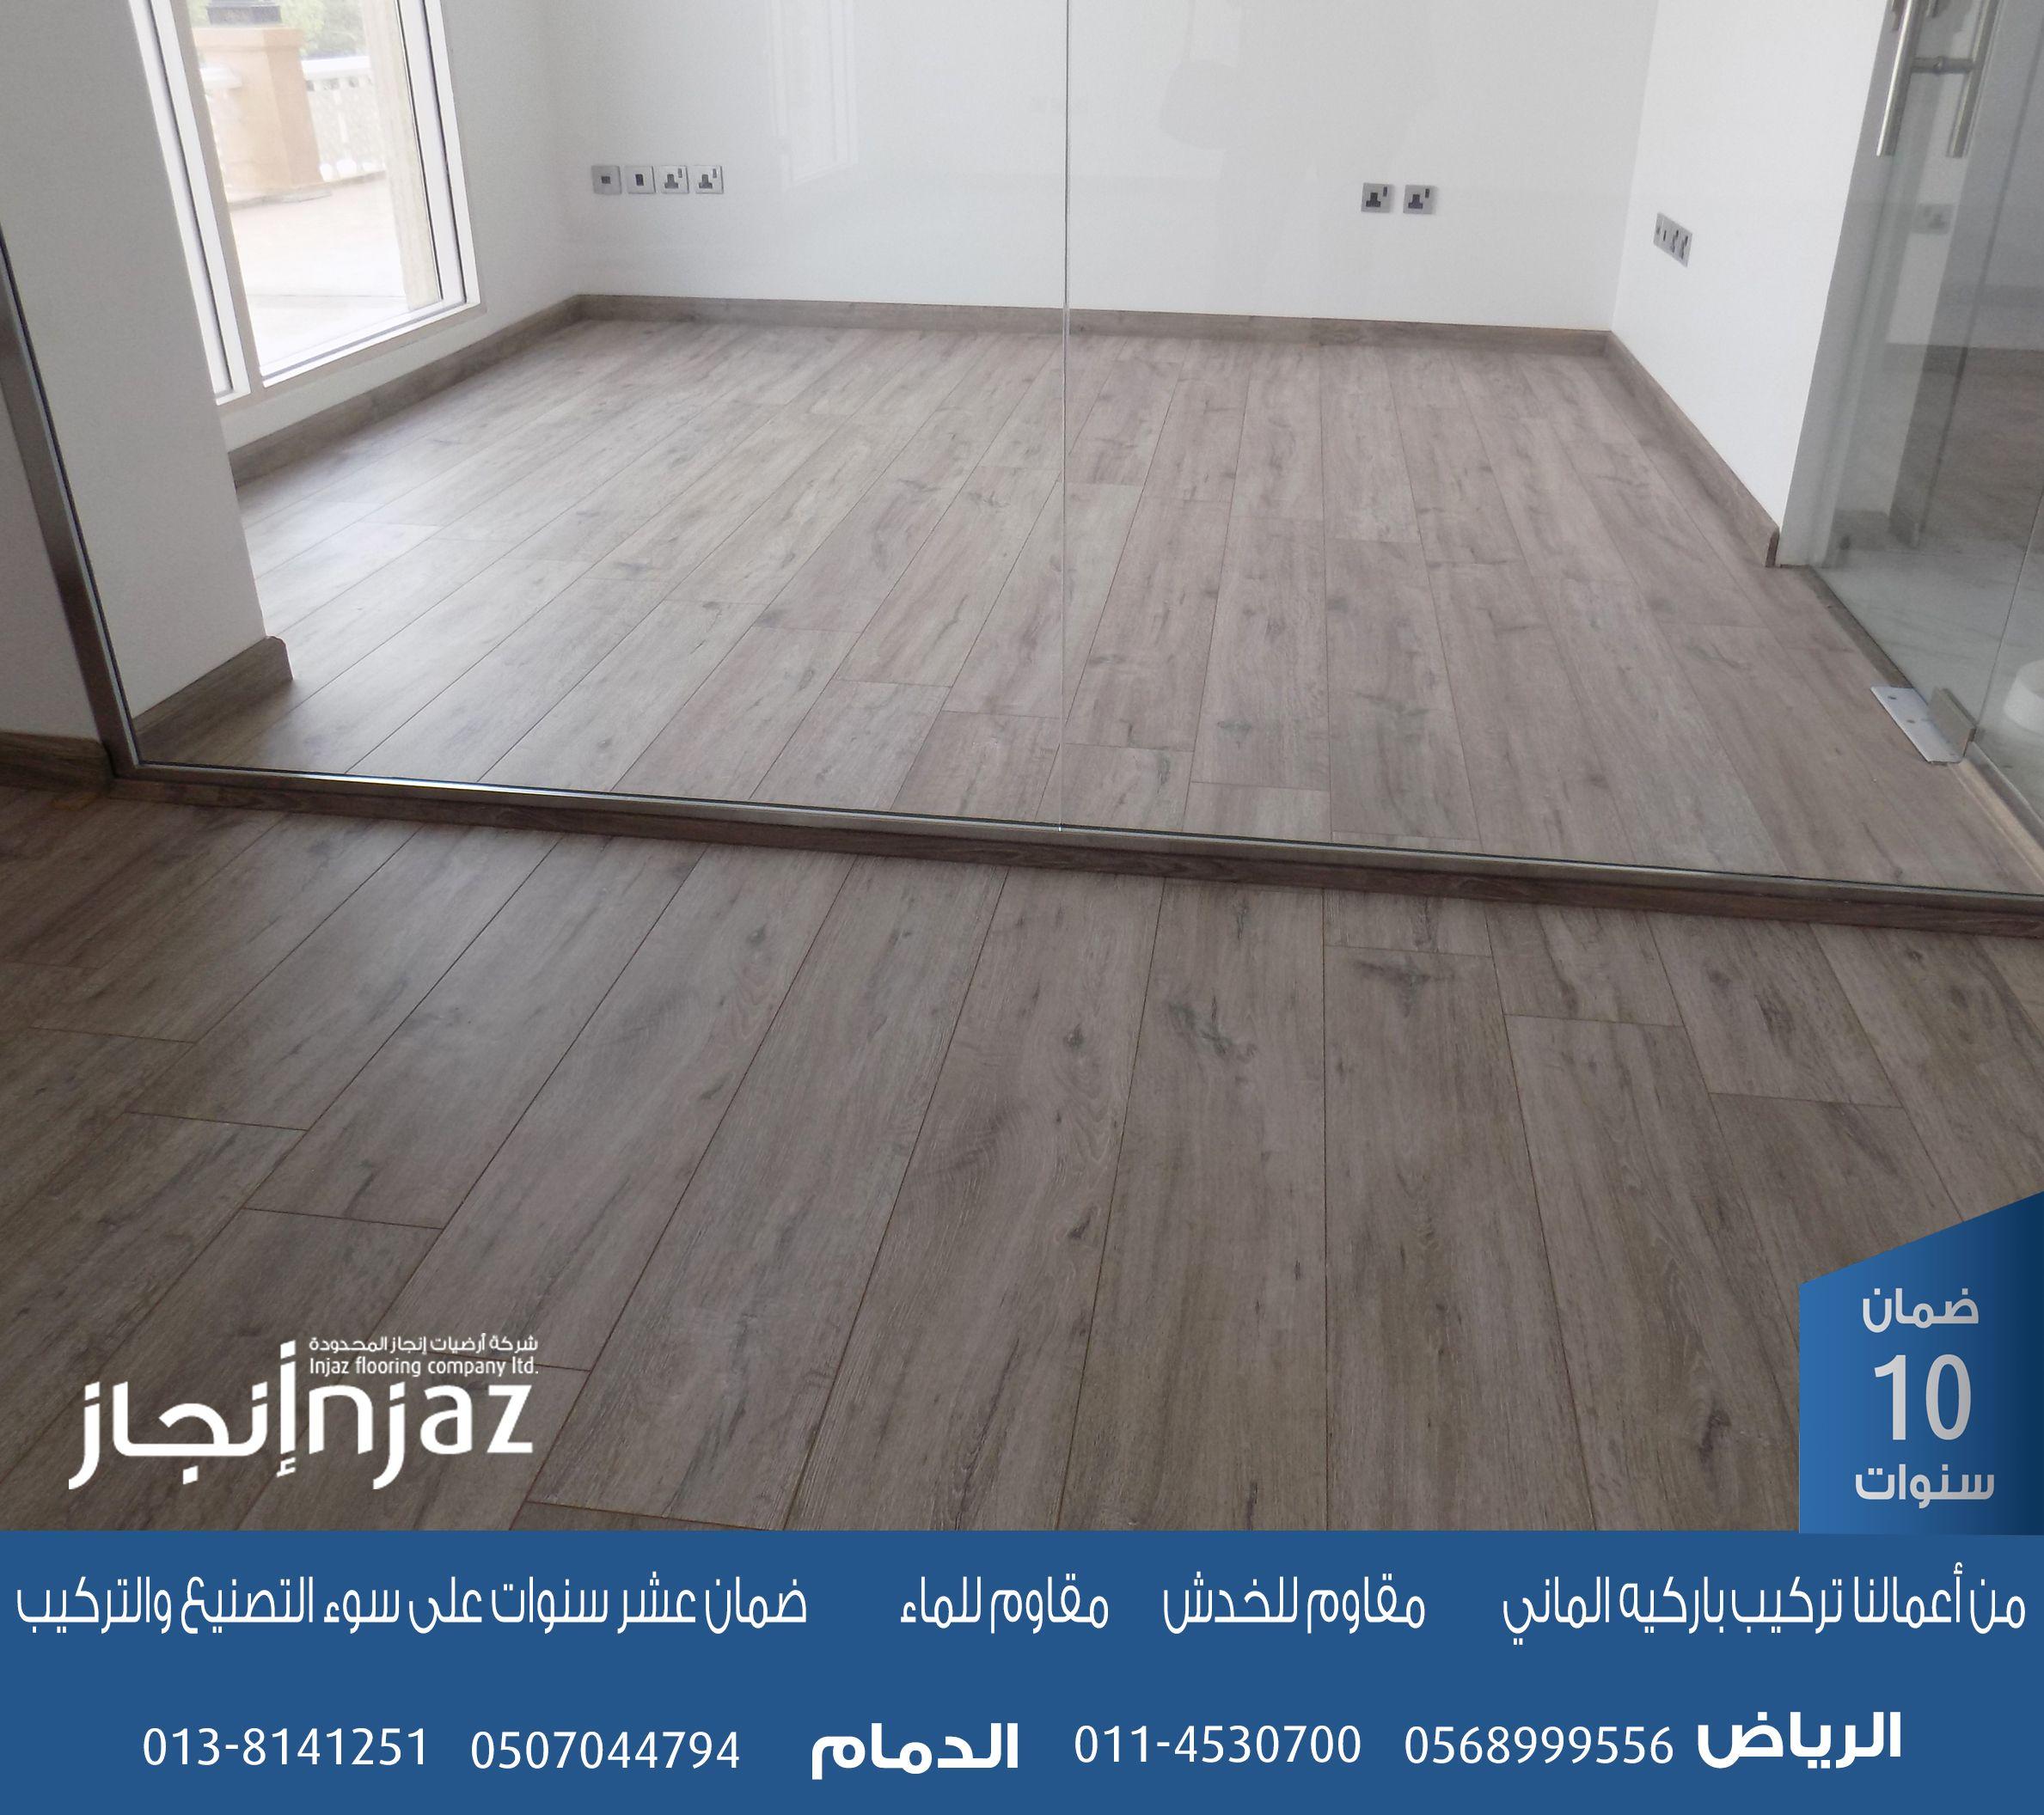 باركيه انجاز الماني Wood Laminate Flooring Living Room Designs Bedroom Wall Designs